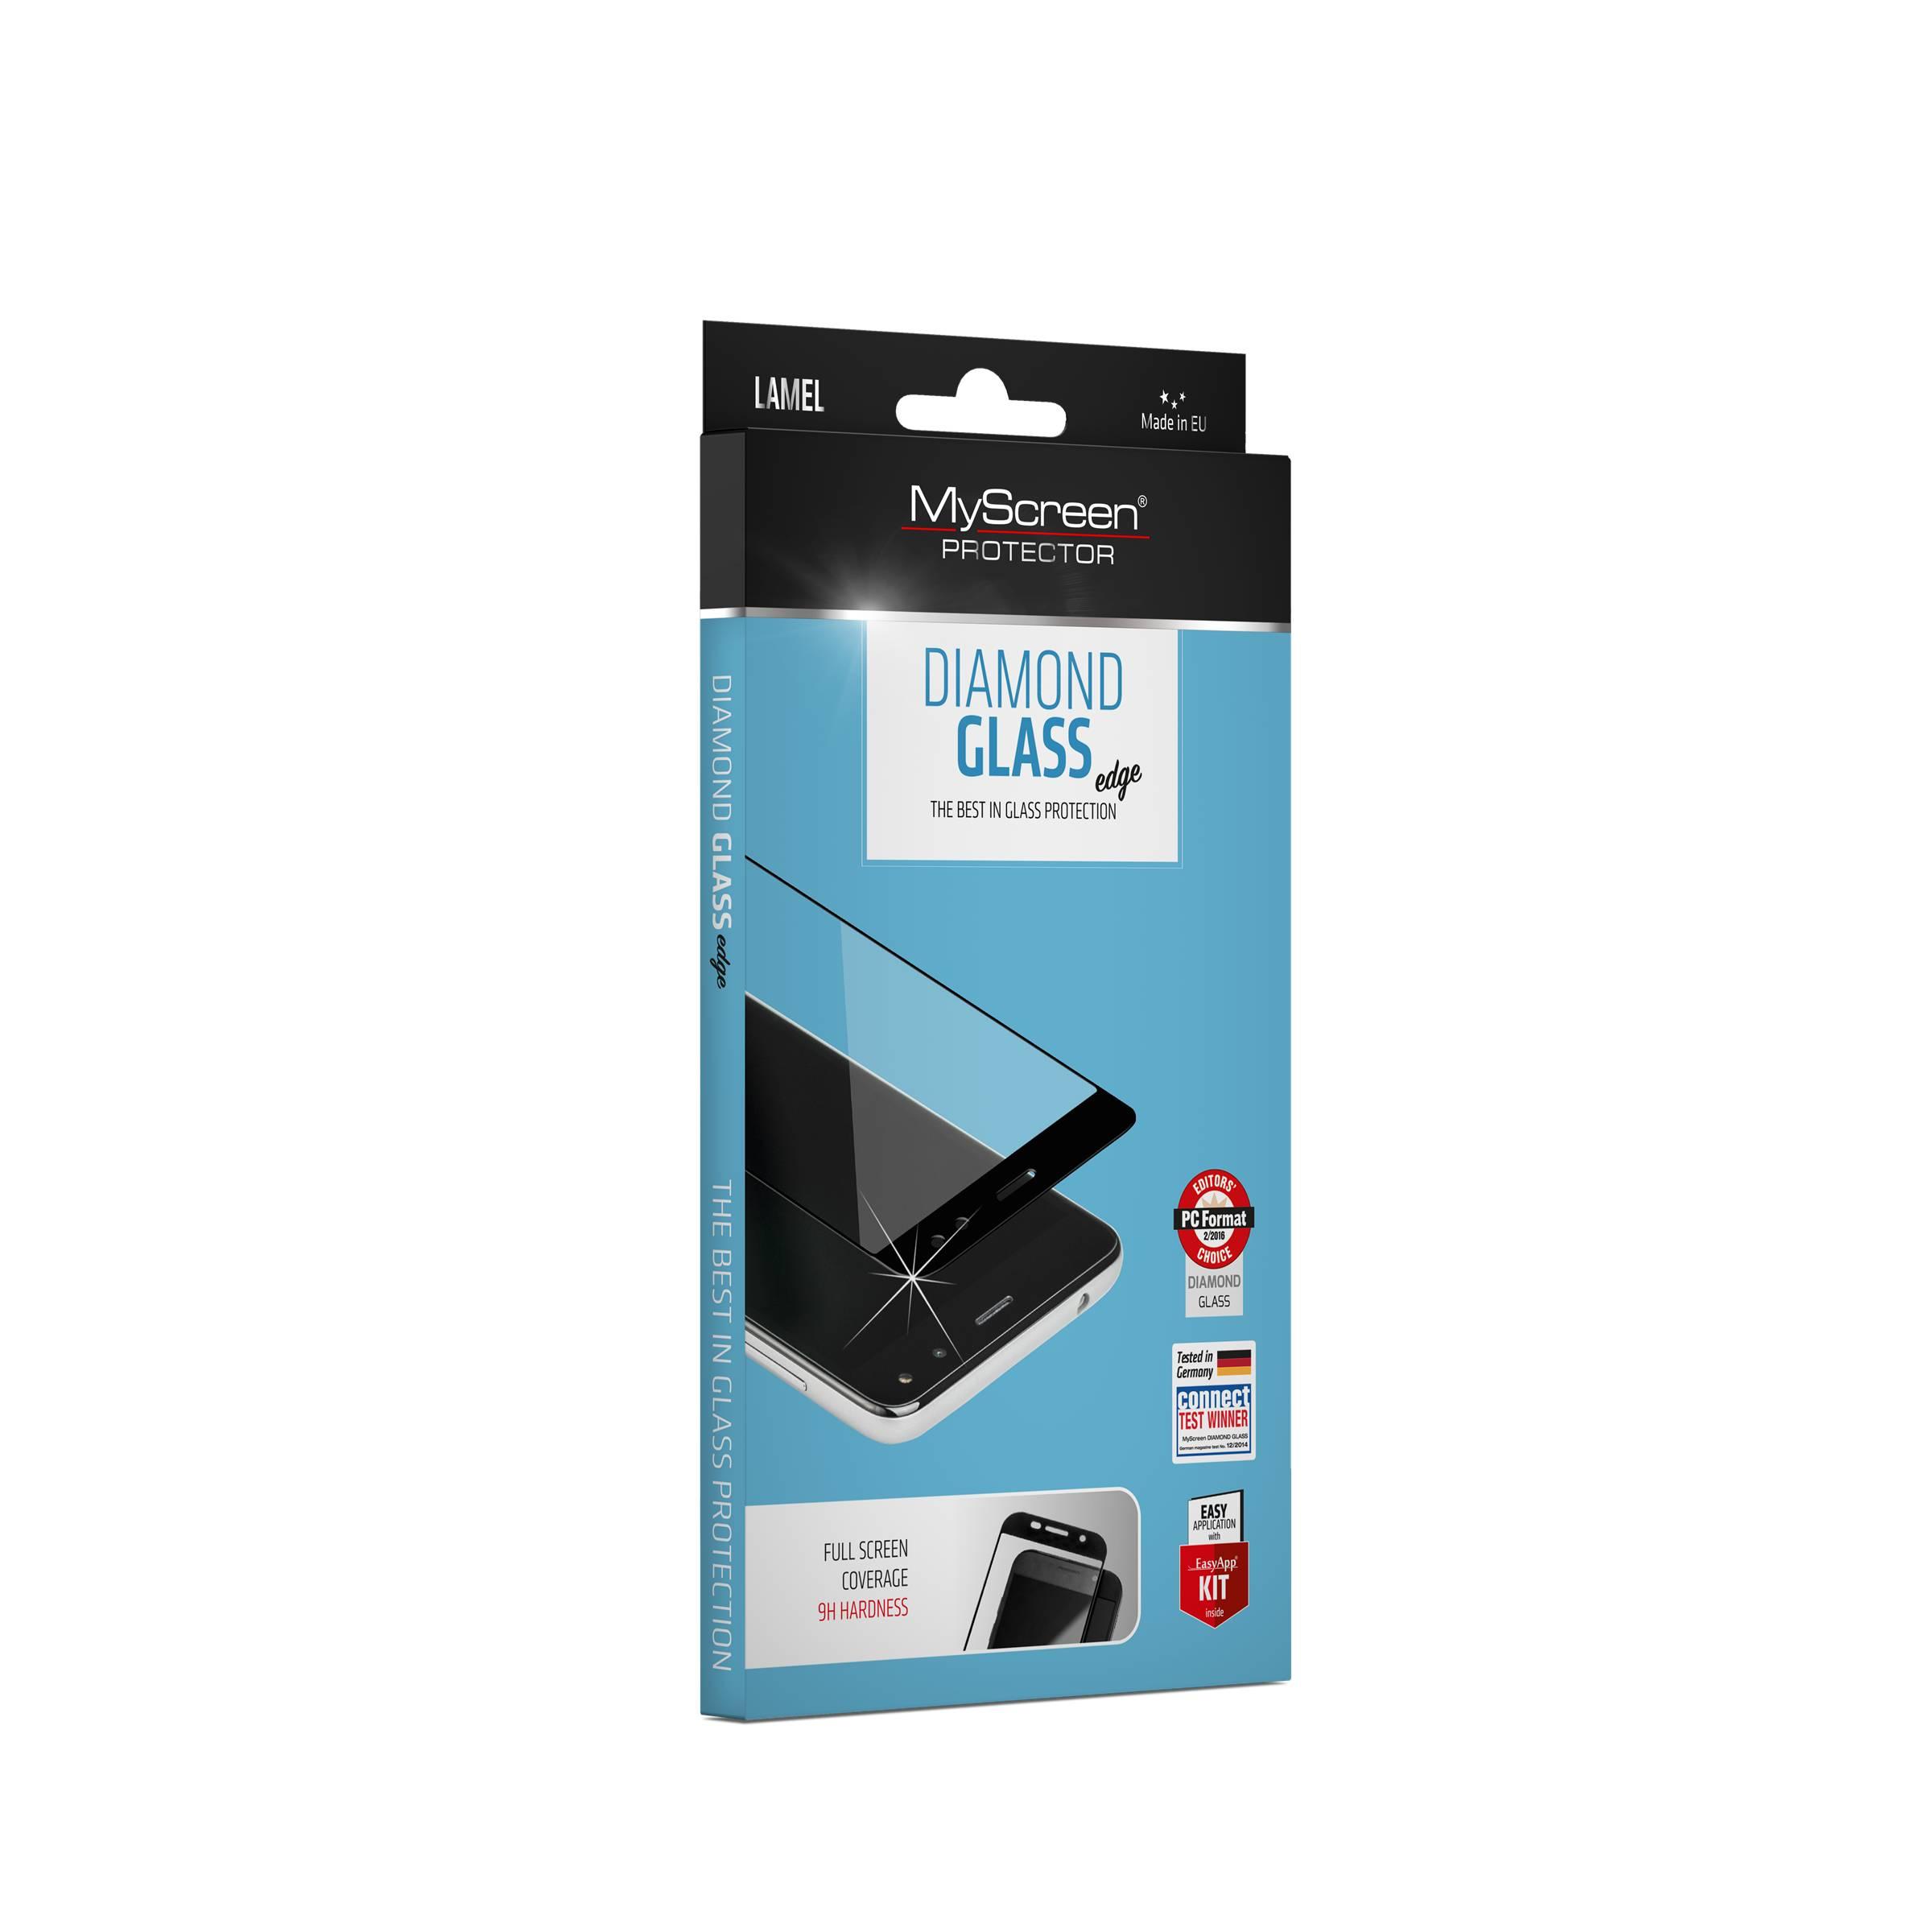 myscreen – Myscreen edge iphone 7/8 hvid beskyttelsesglas fra mackabler.dk